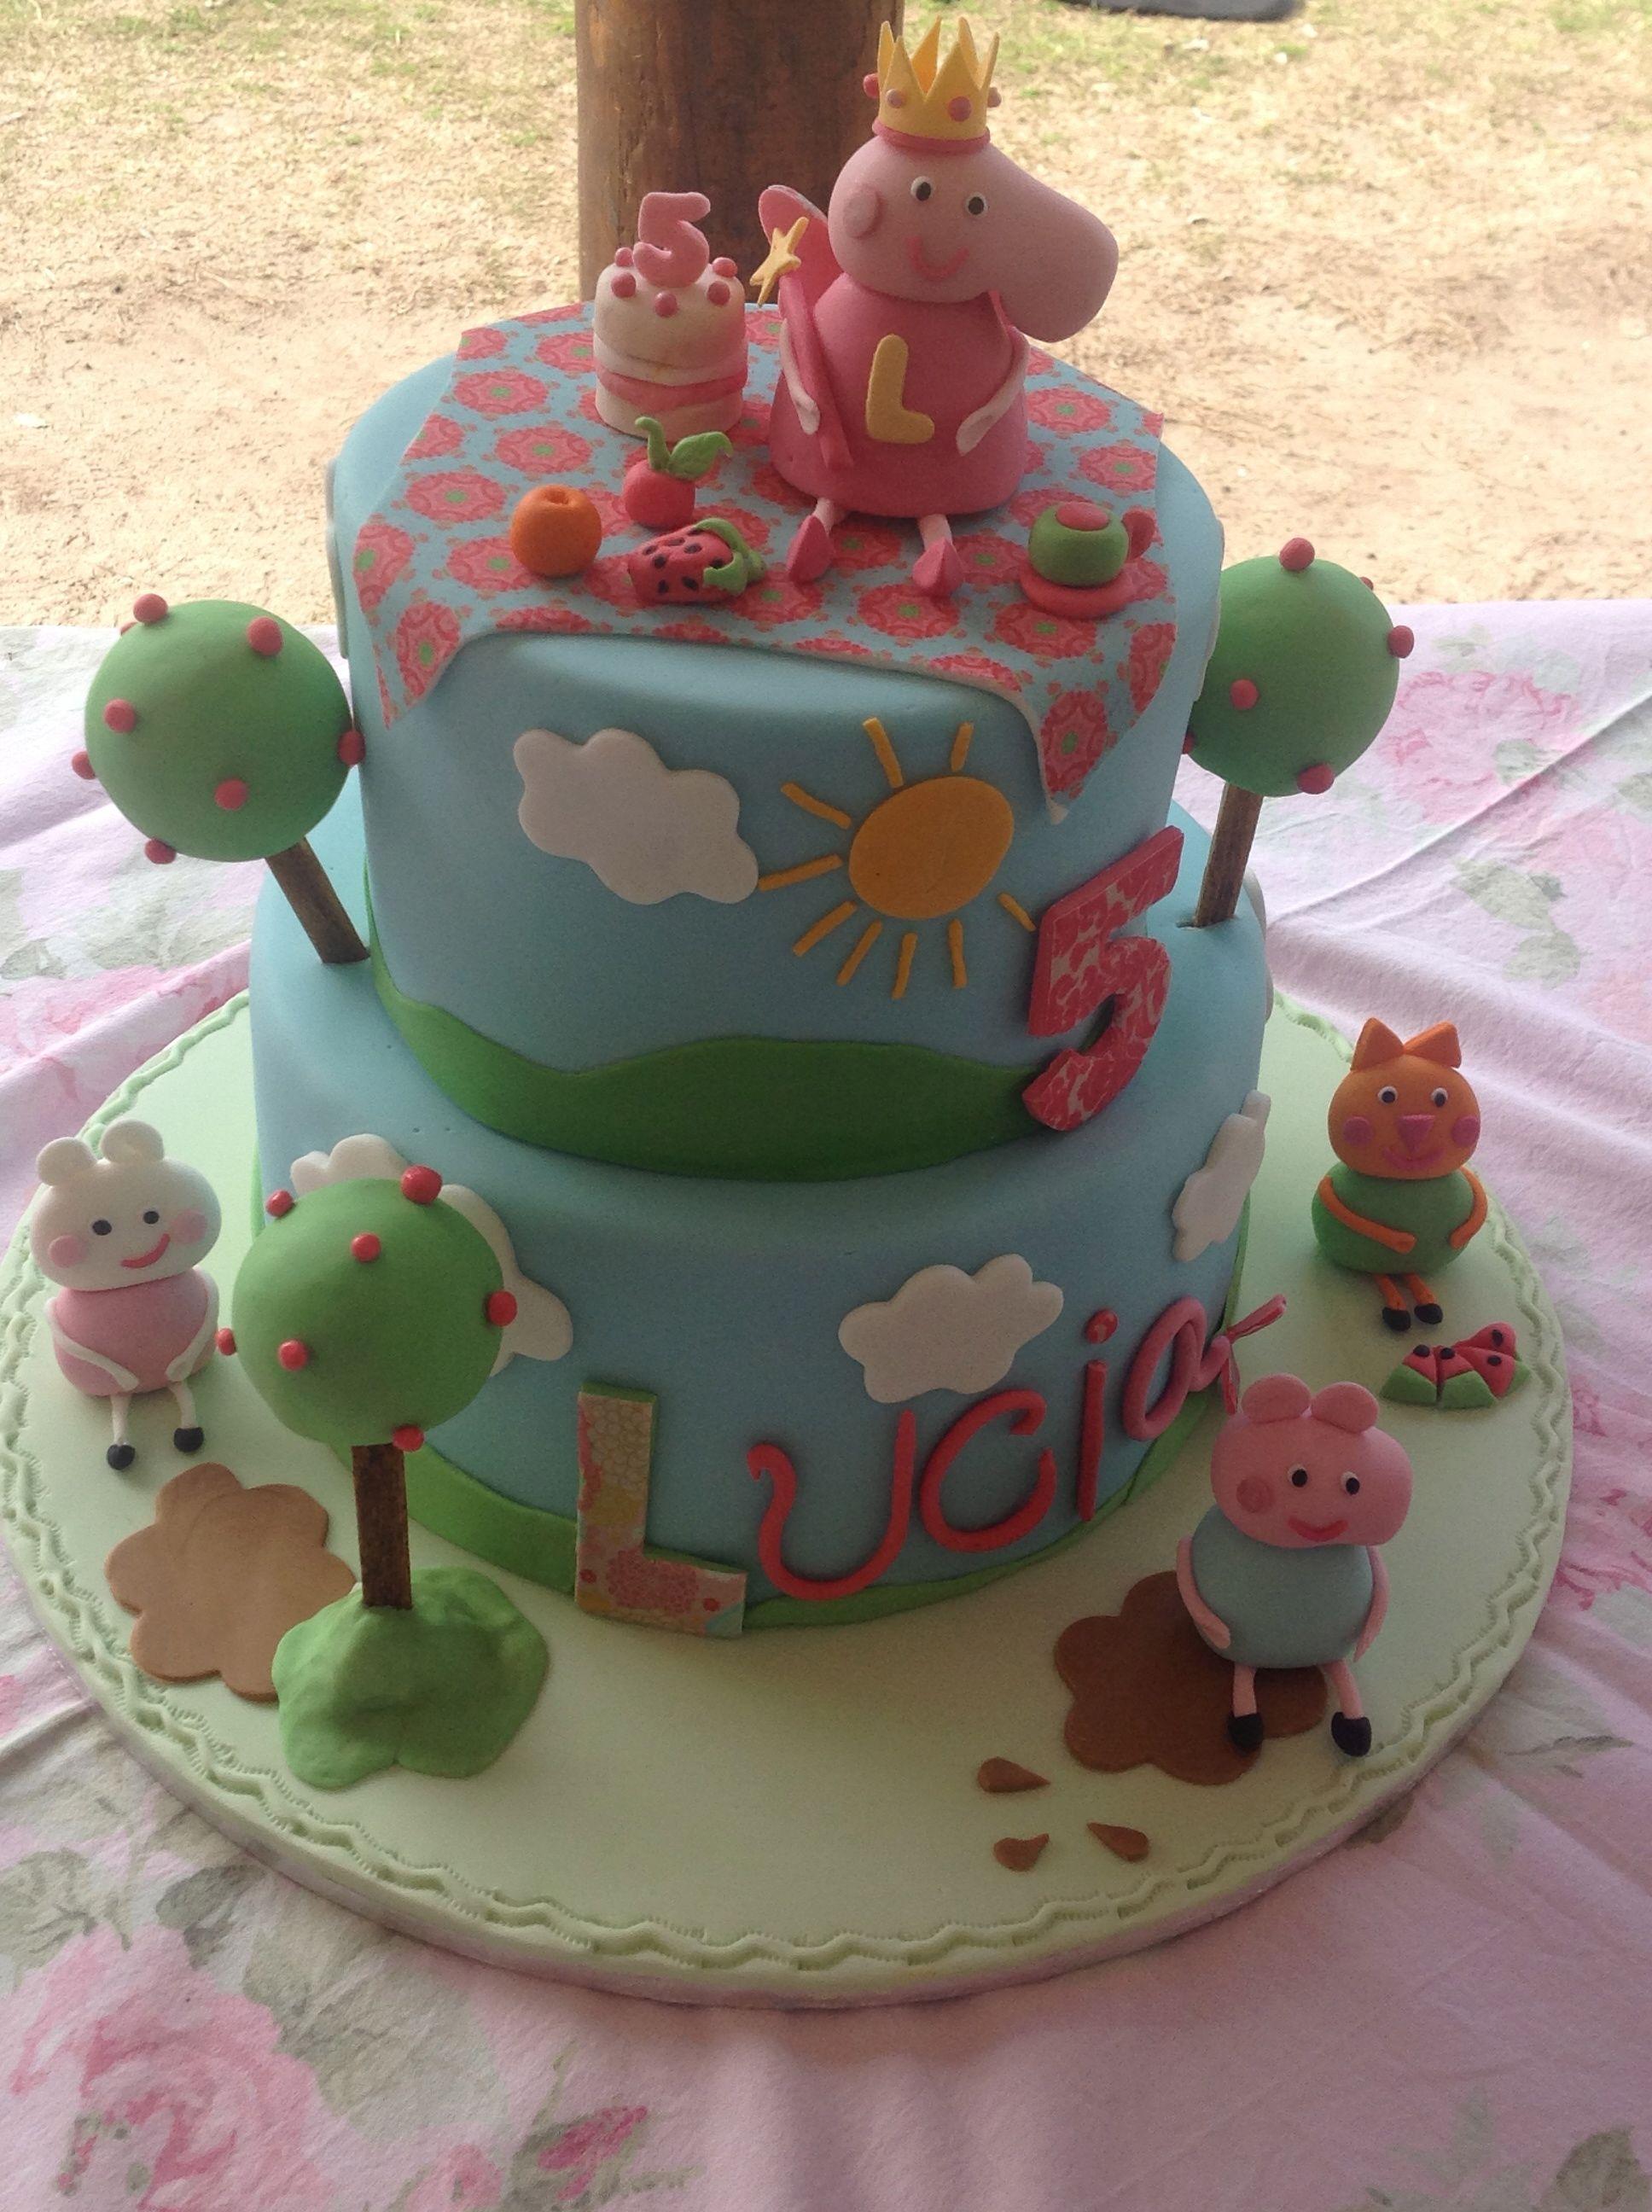 My Peppa Pig Birthday Cake For My Daughters 5th Birthday Peppa